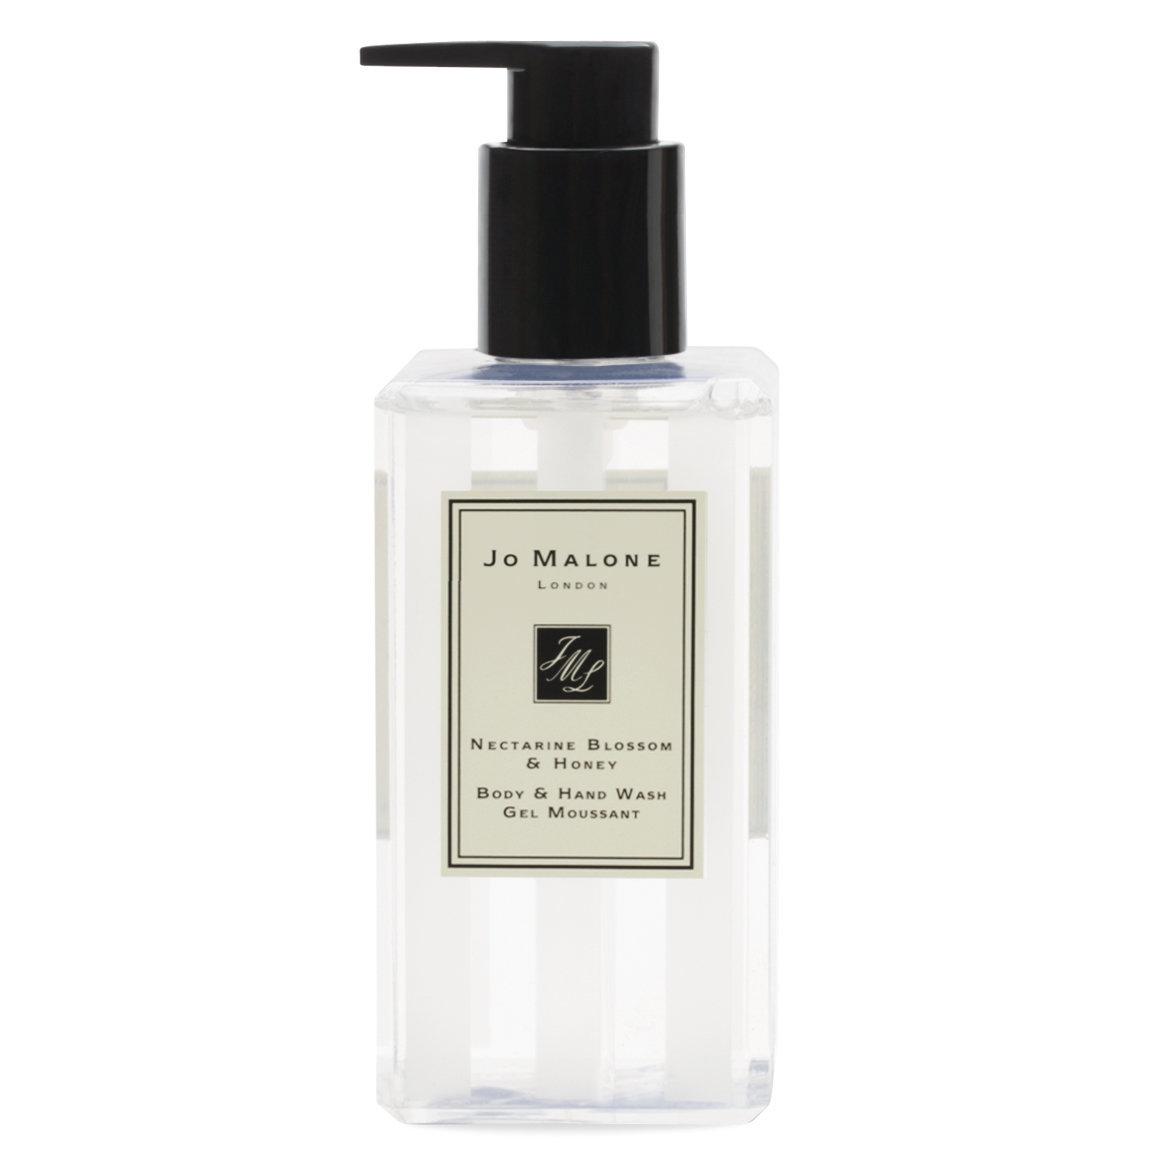 Jo Malone London Nectarine Blossom & Honey Body & Hand Wash product swatch.